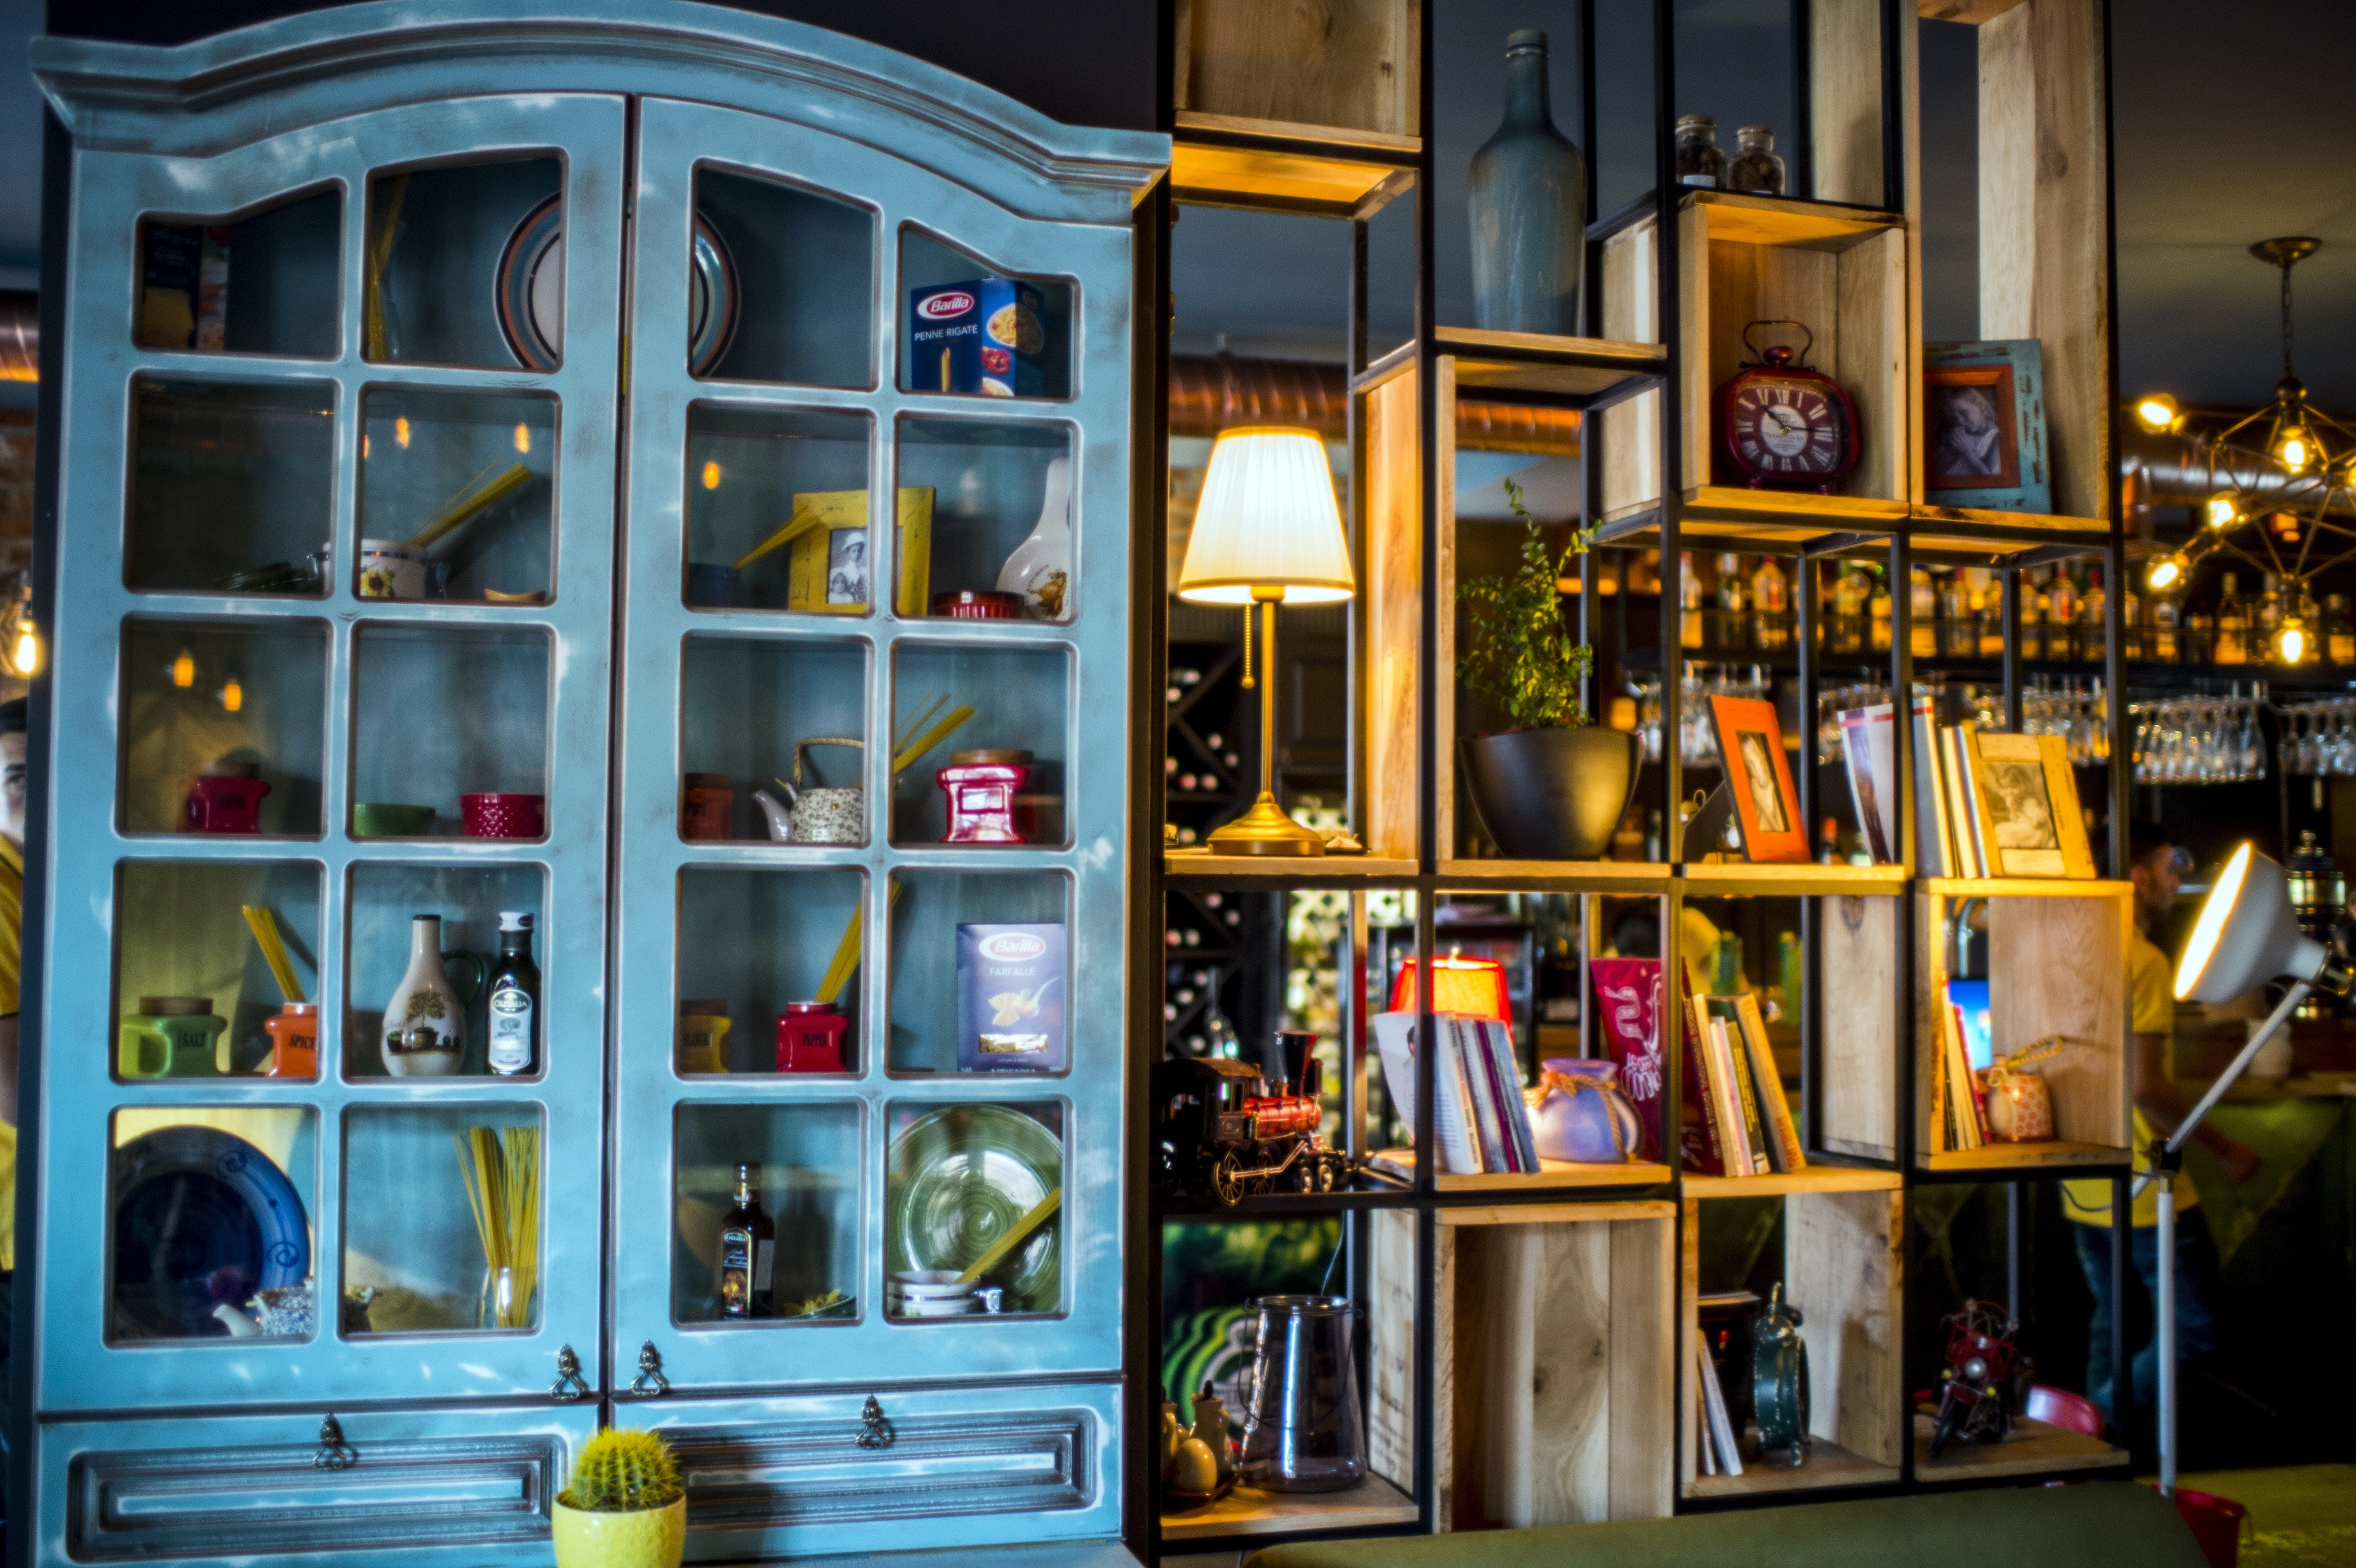 Longest Standing Gift Shop in Fairhope